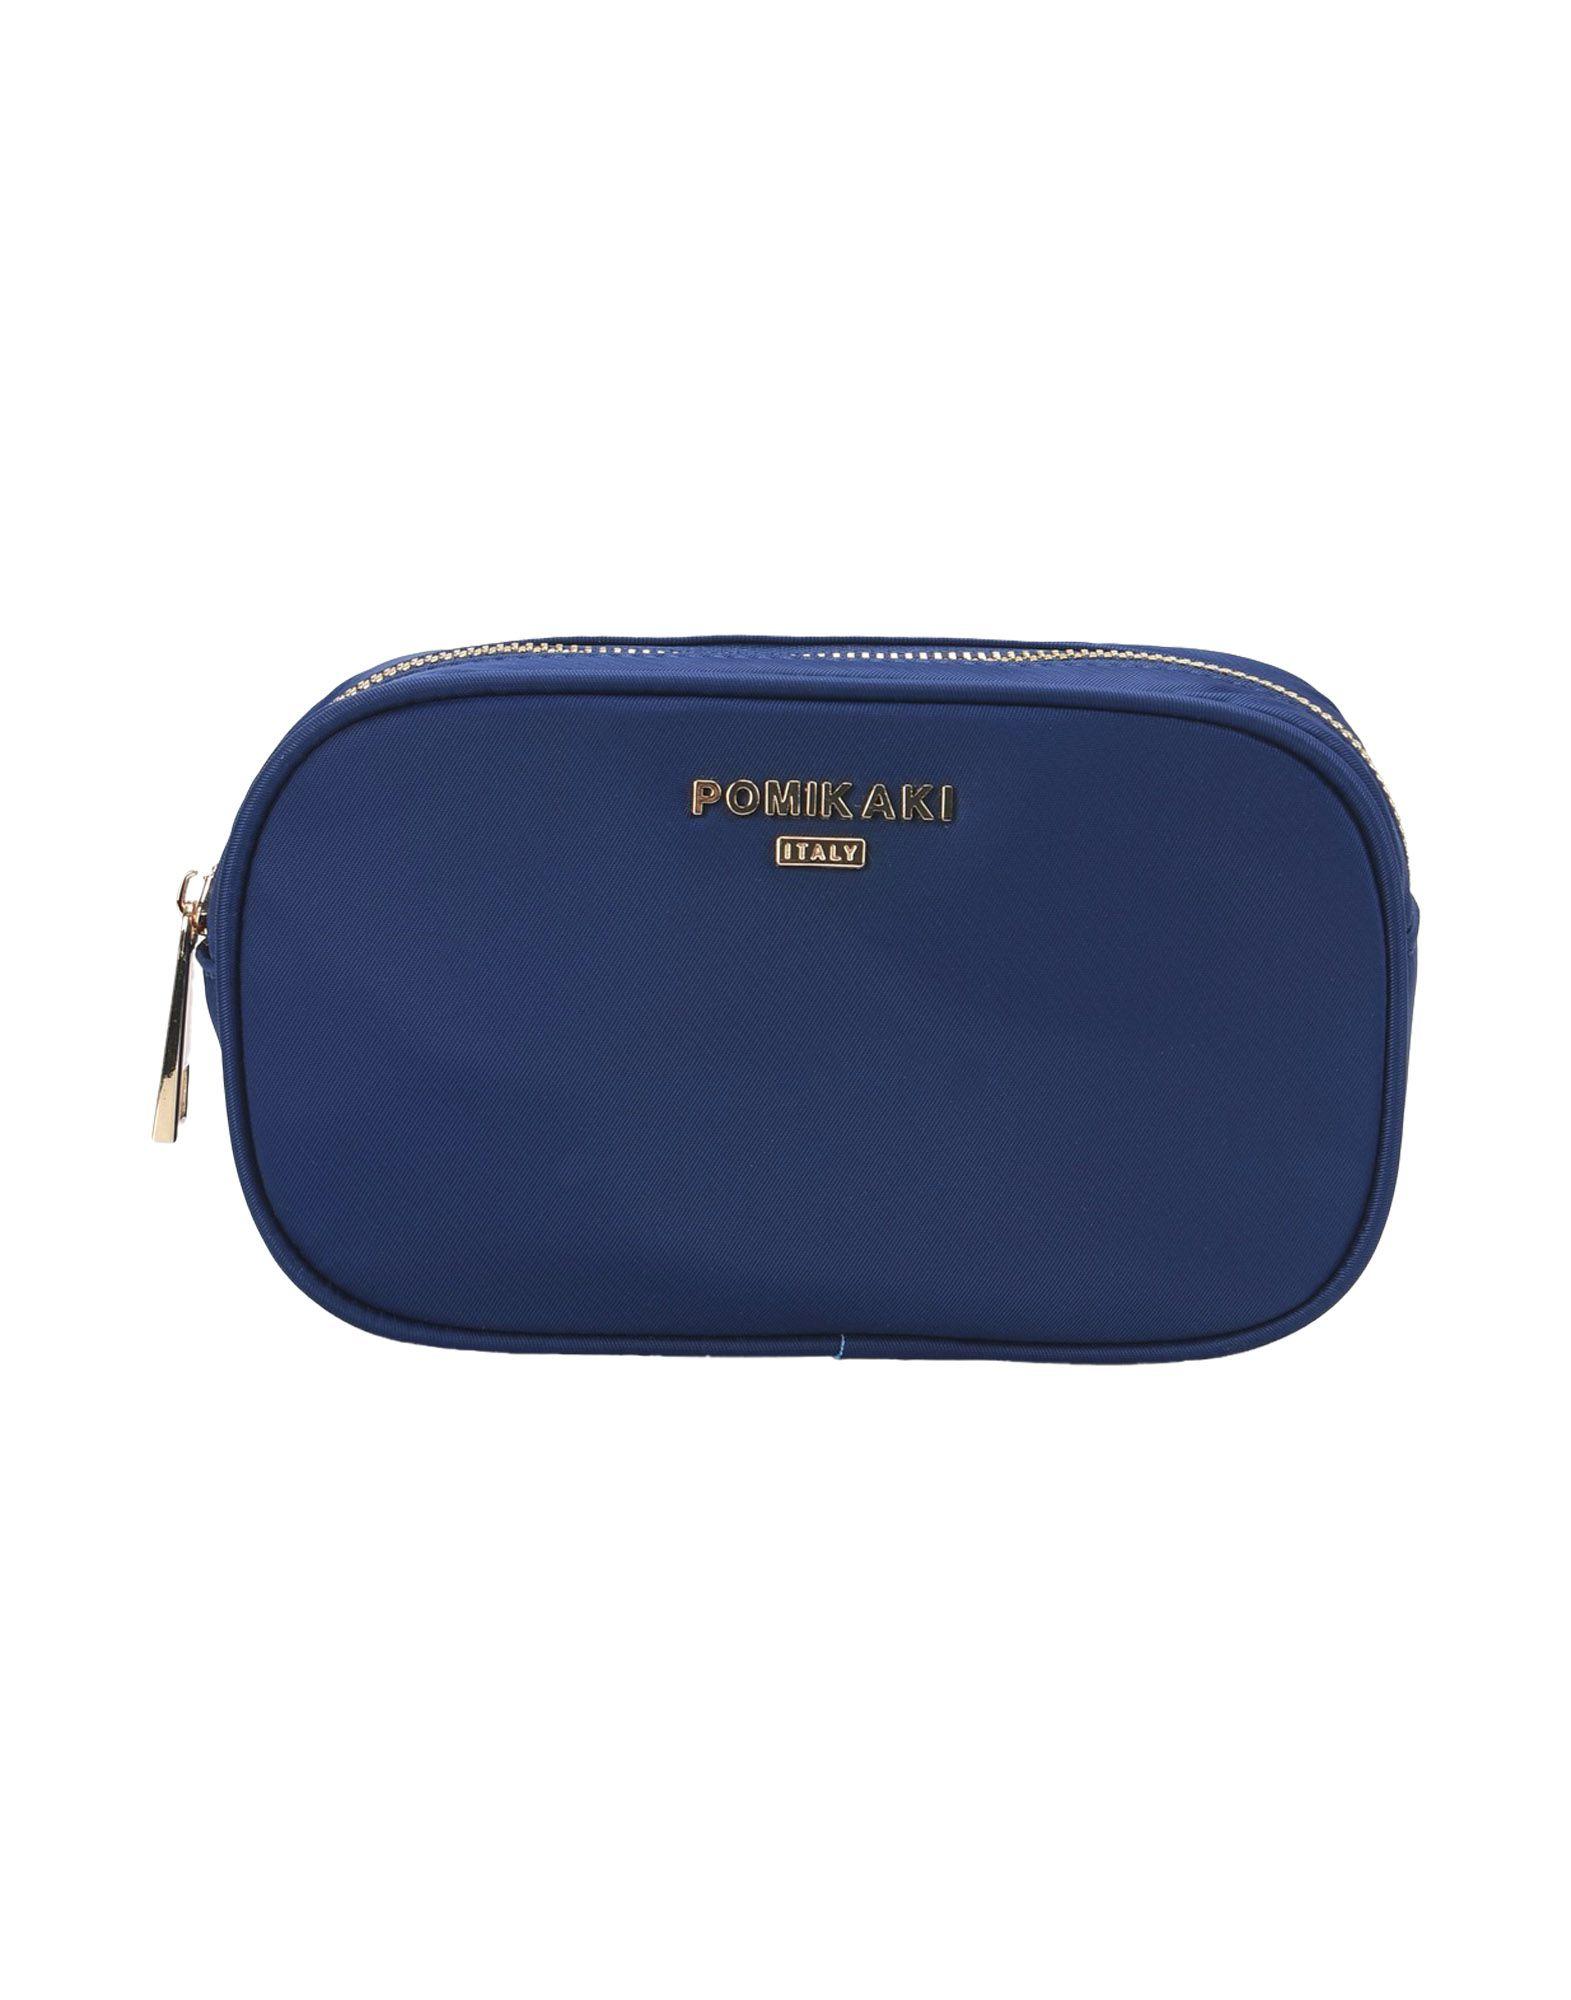 POMIKAKI Beauty case pinetti beauty case